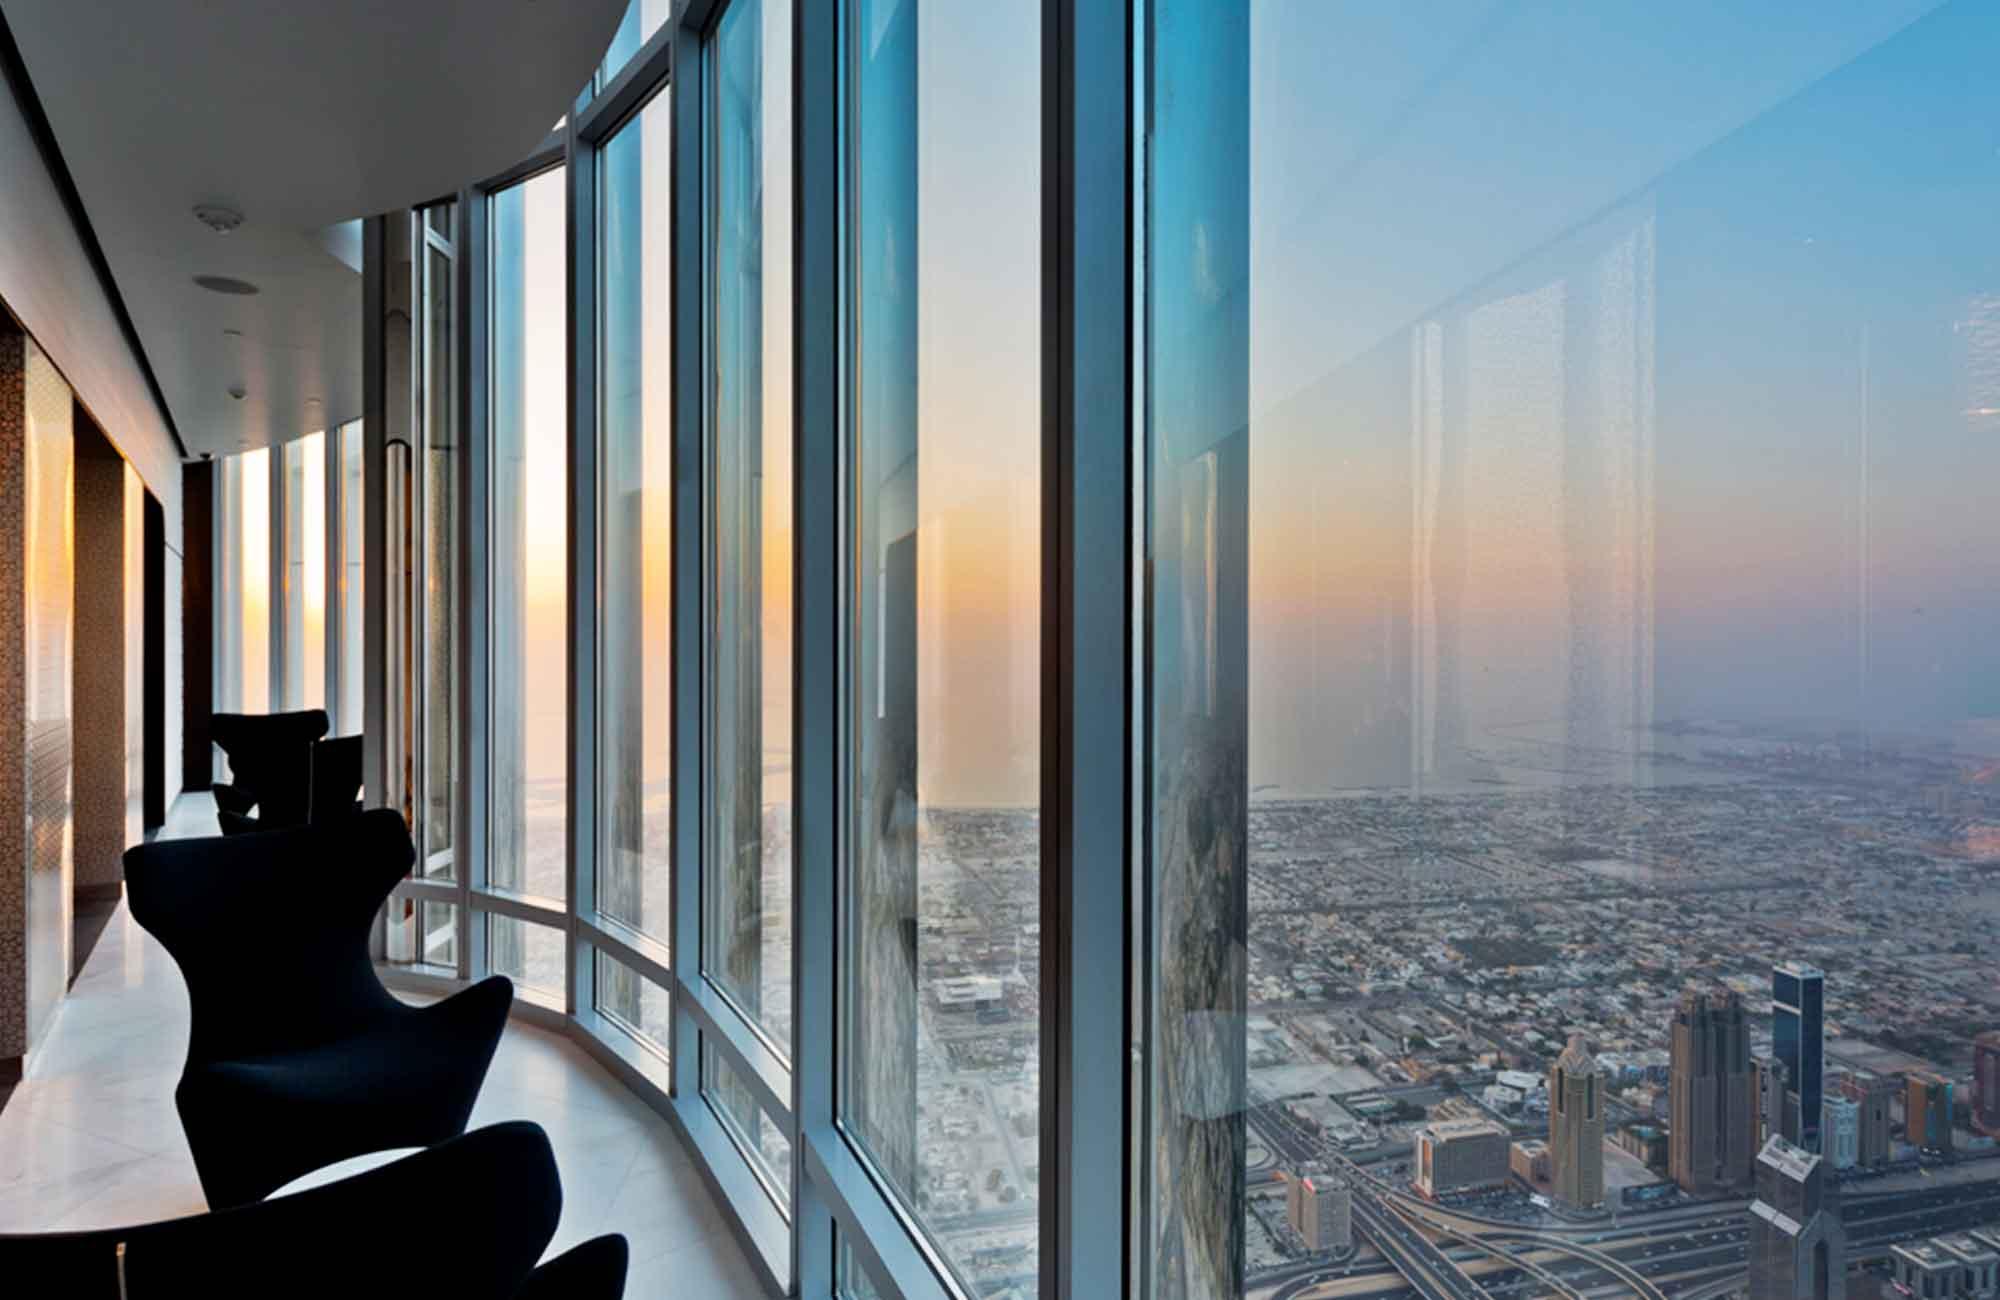 Voyage Emirats Arabes Unis - Burj Khalifa Dubaï - Amplitudes